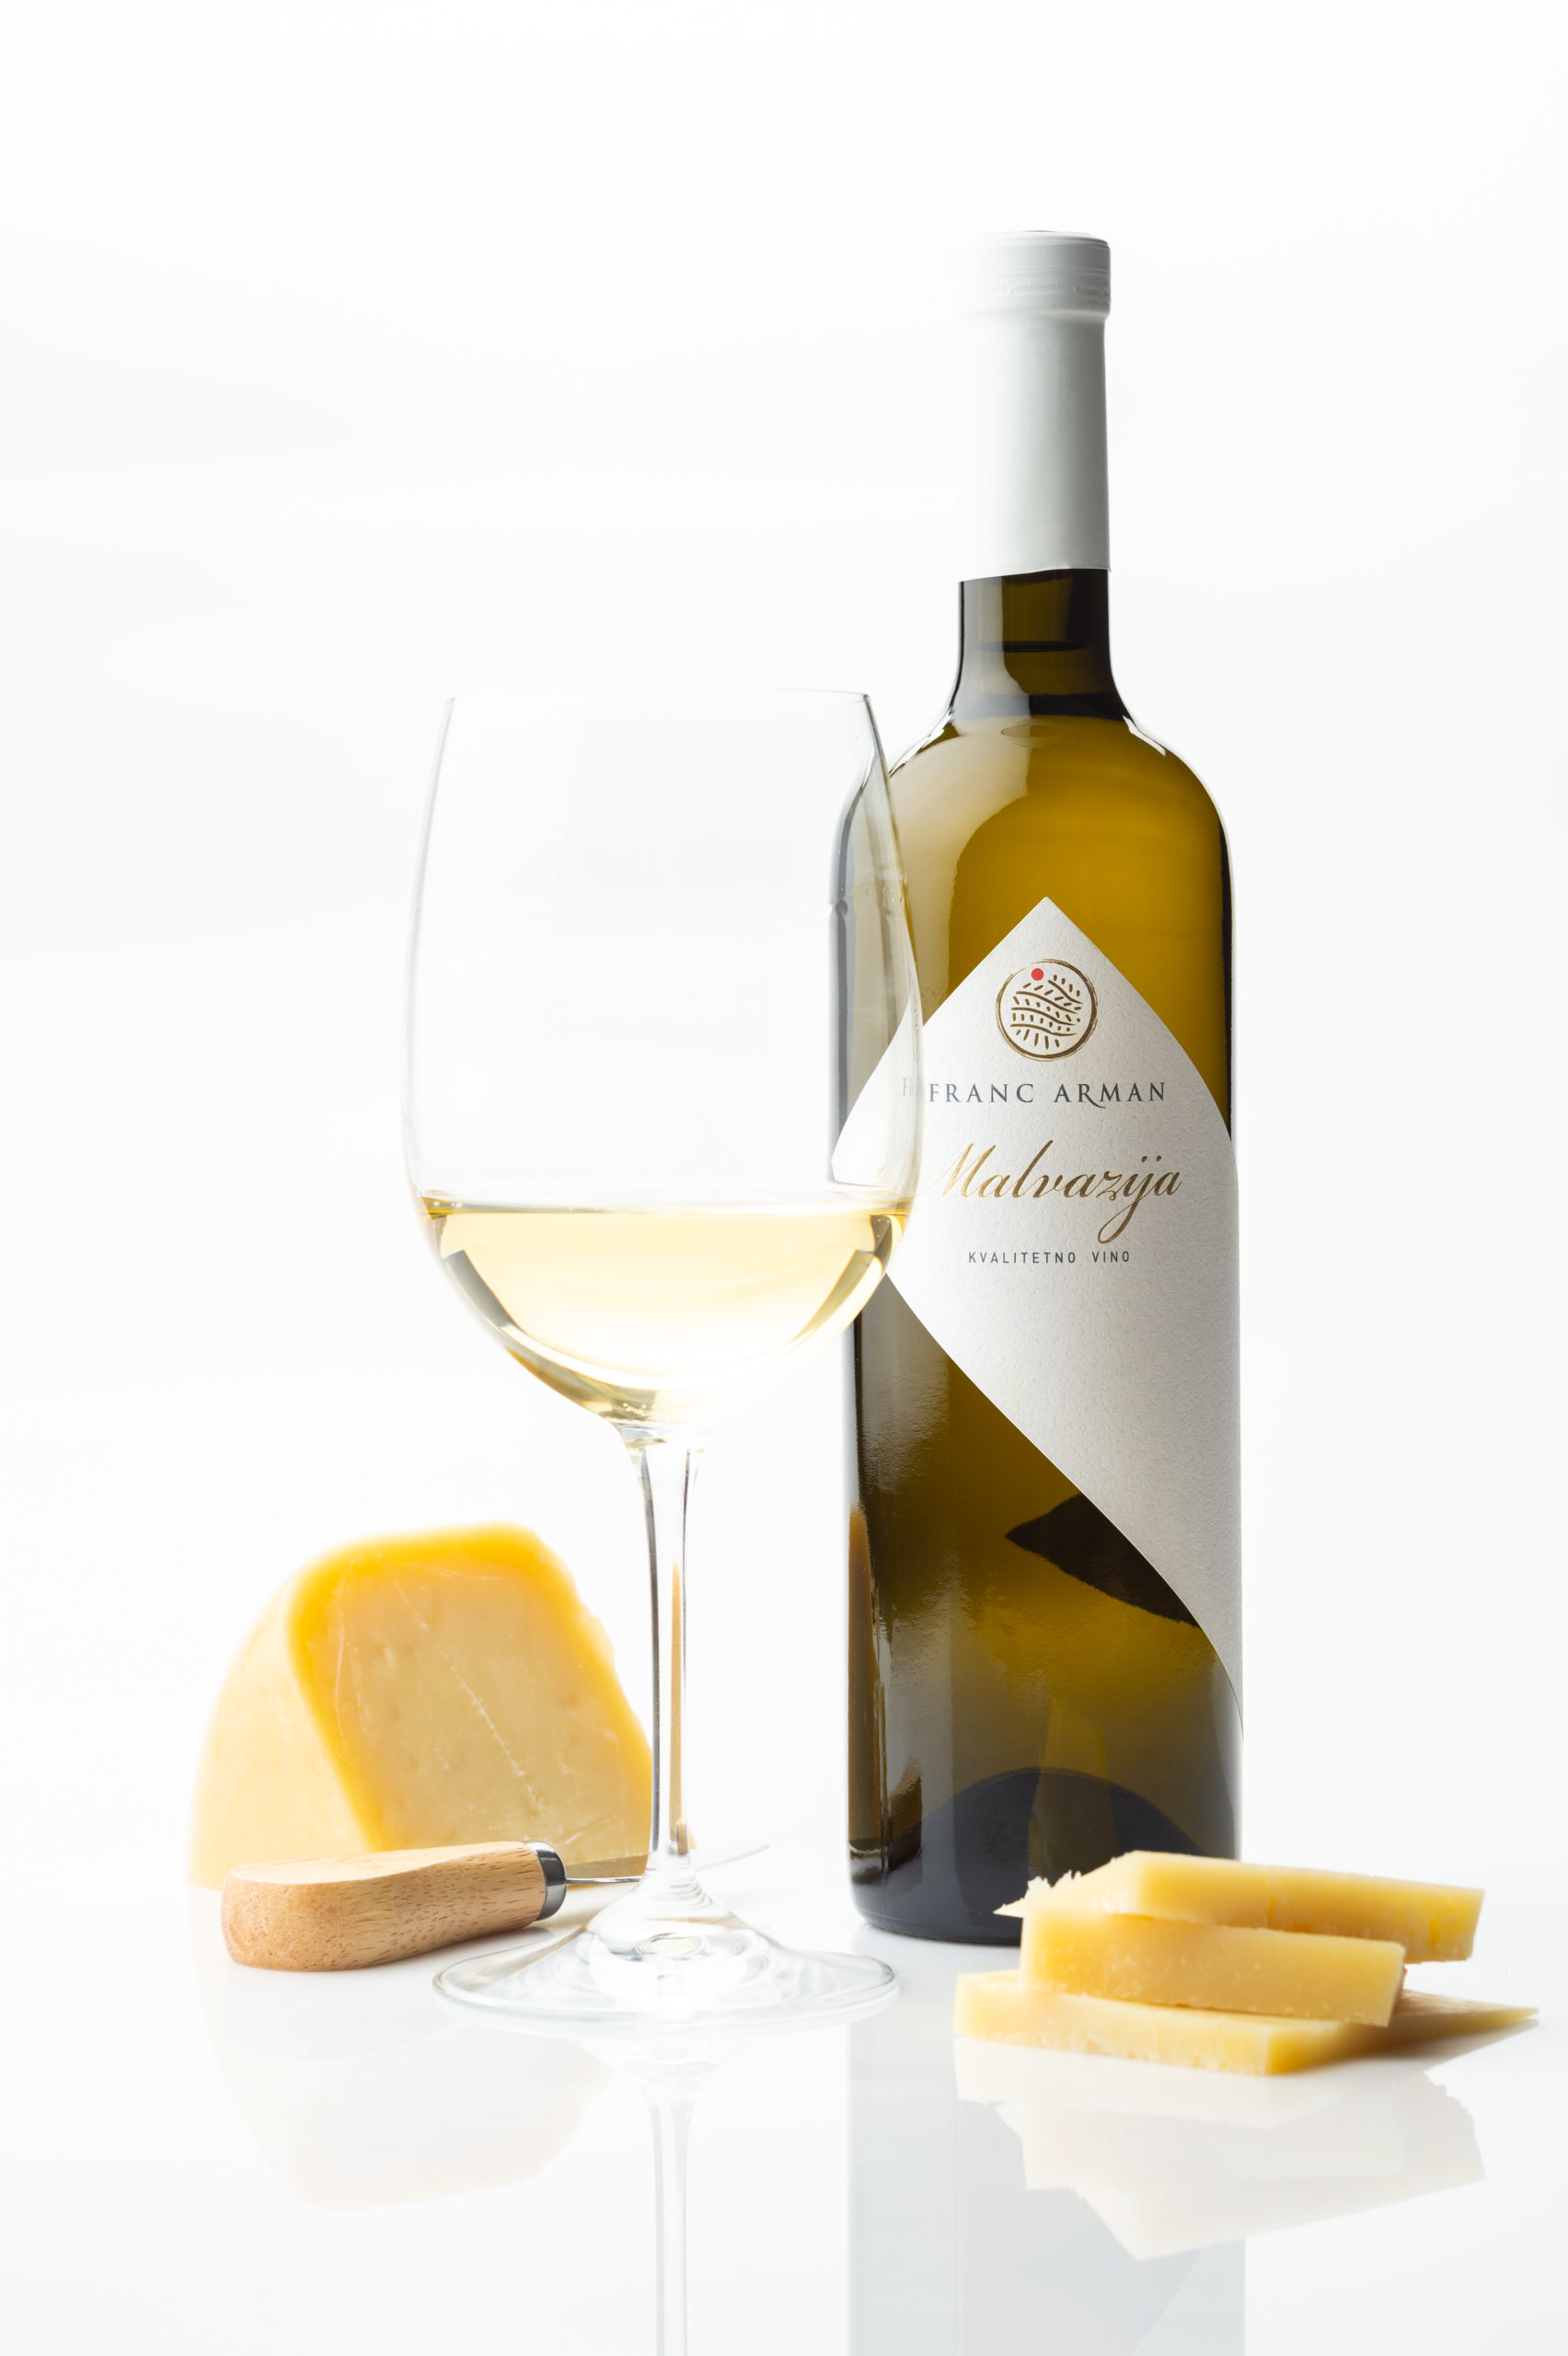 hren | plethora of creativity // Franc Arman Winery